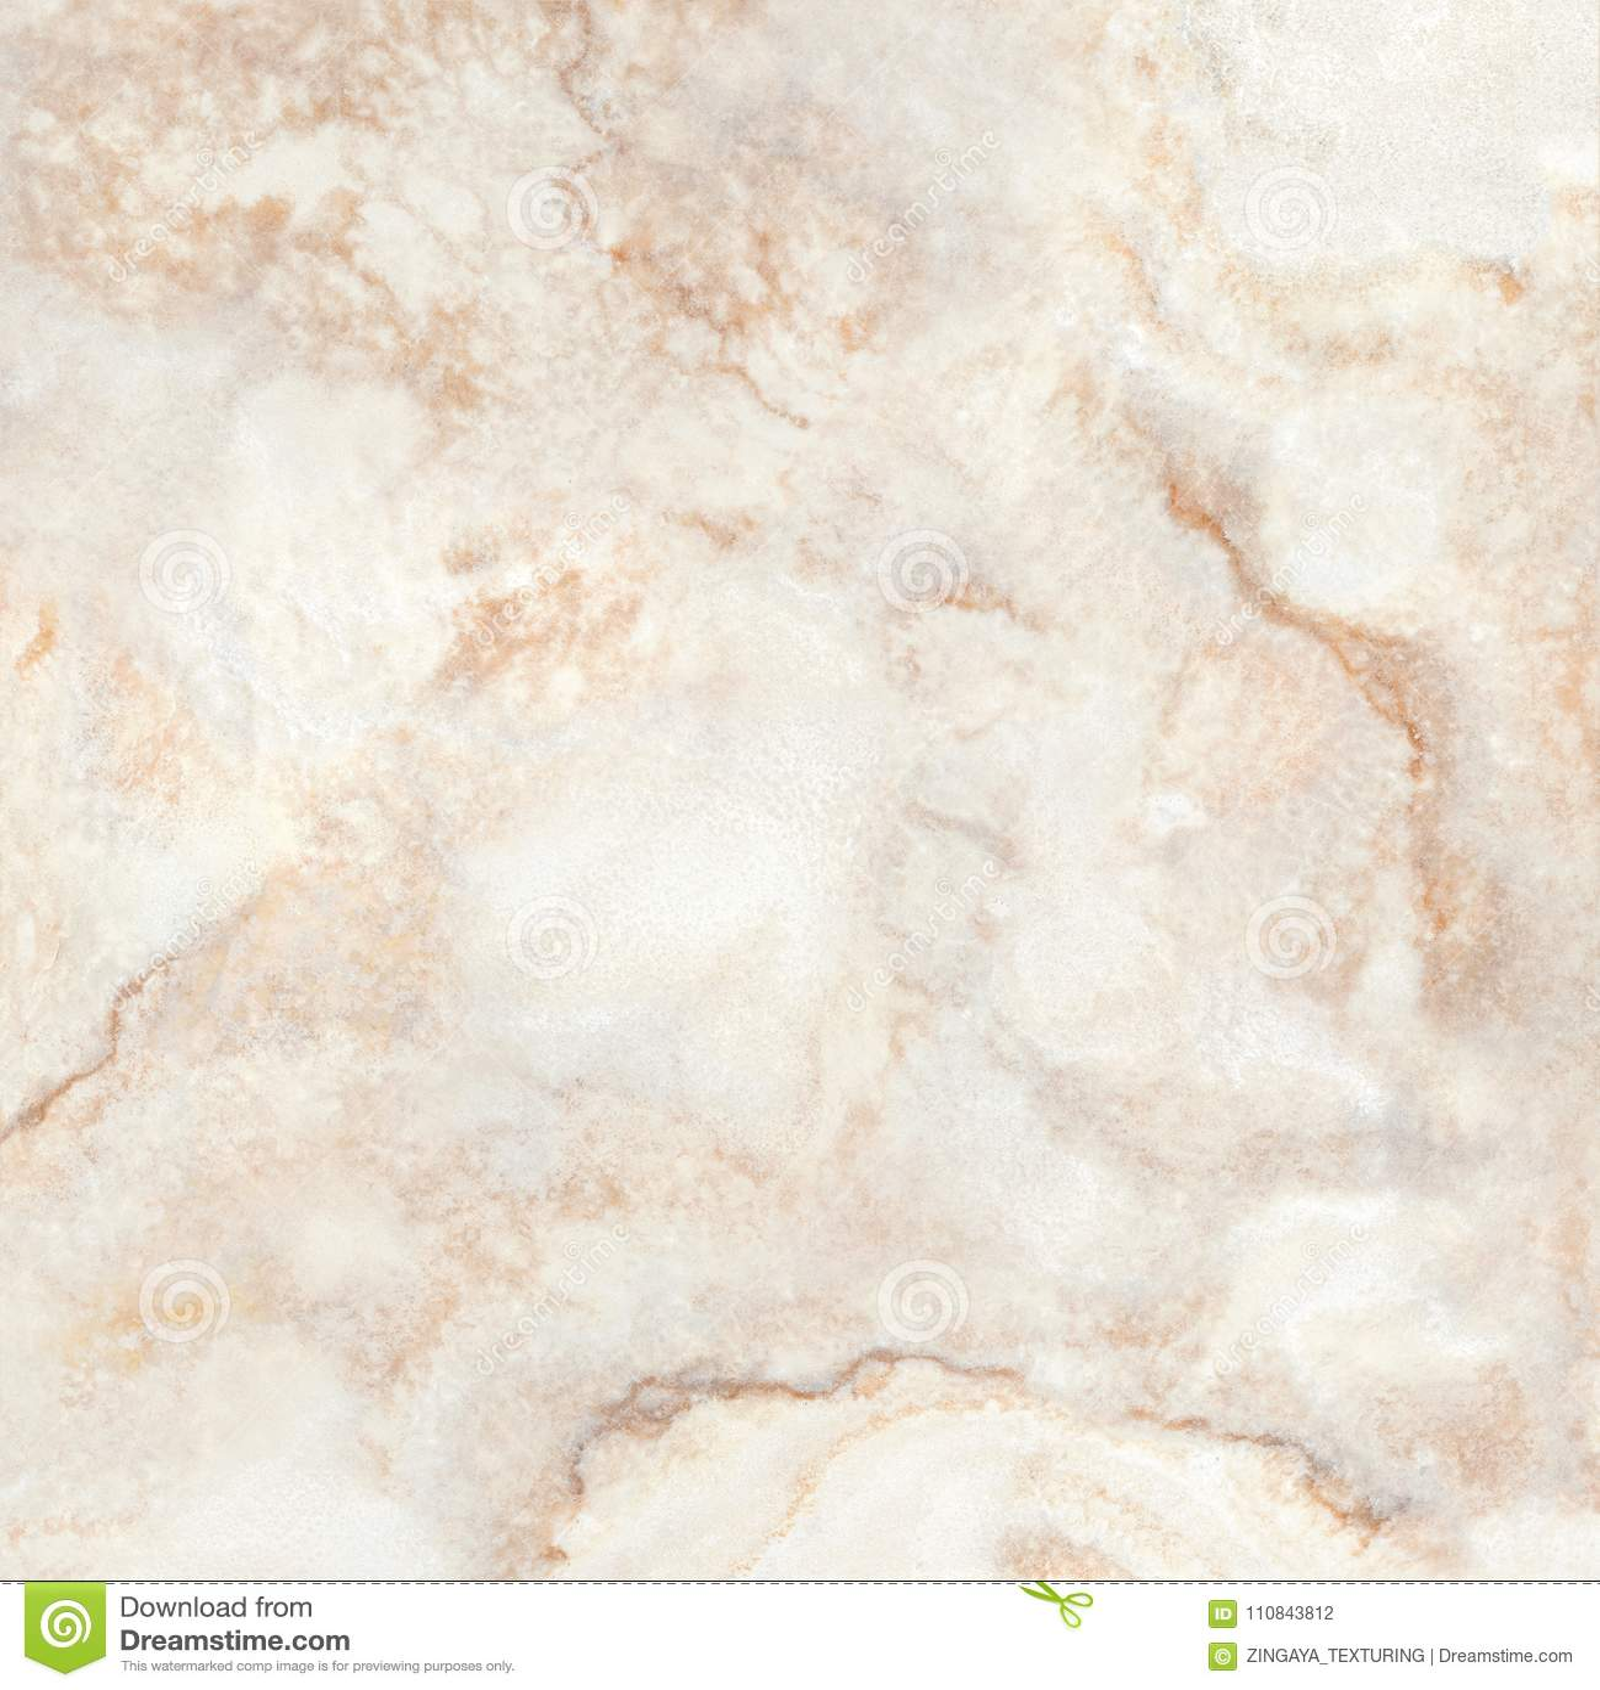 Travertino Marble Texture Stone Background Tile Design Stock Photo Image Of Italian Agate 110843812